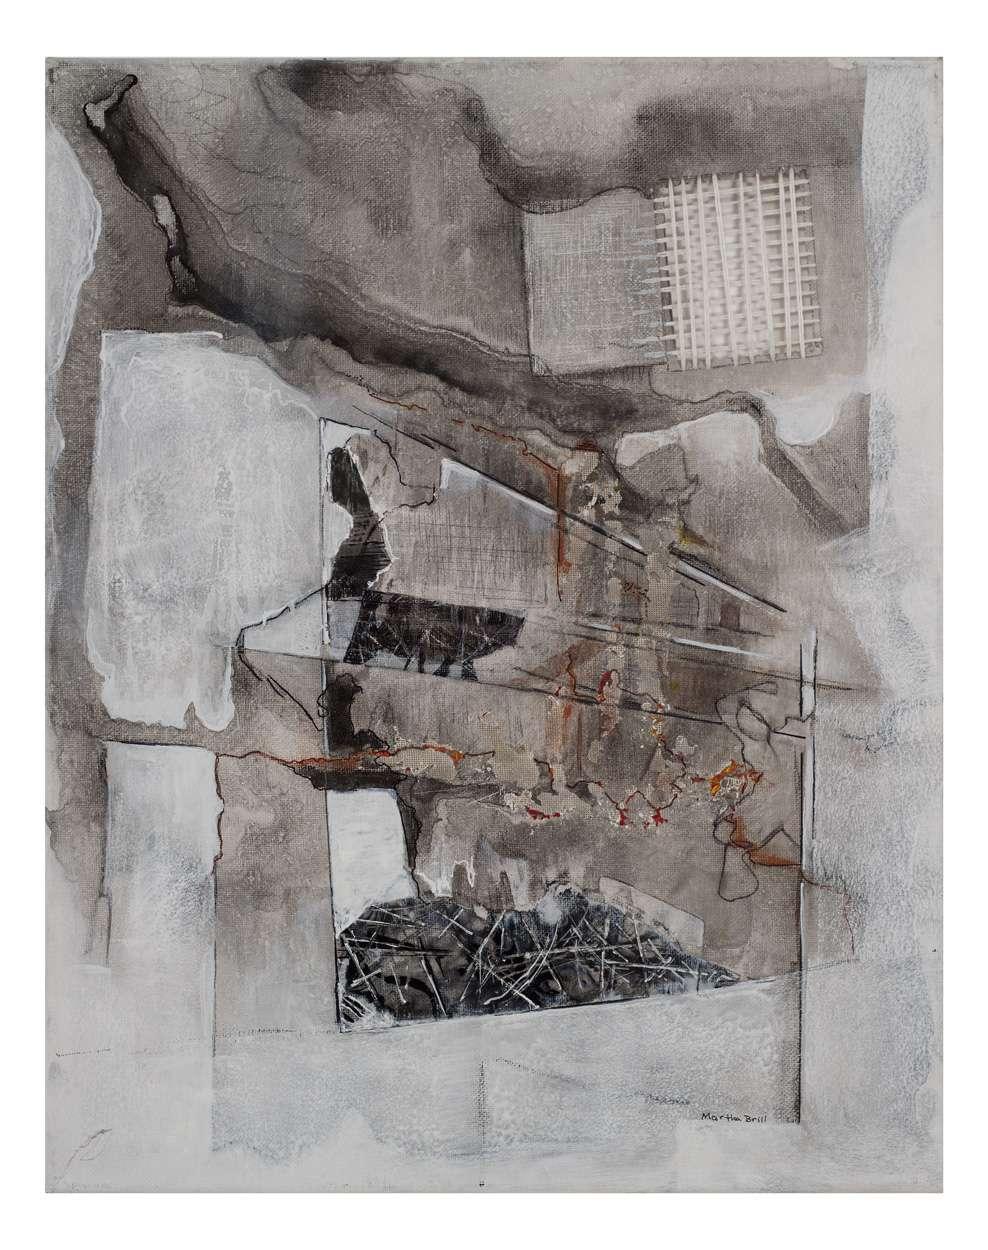 Concrete Cell by Martha Brill